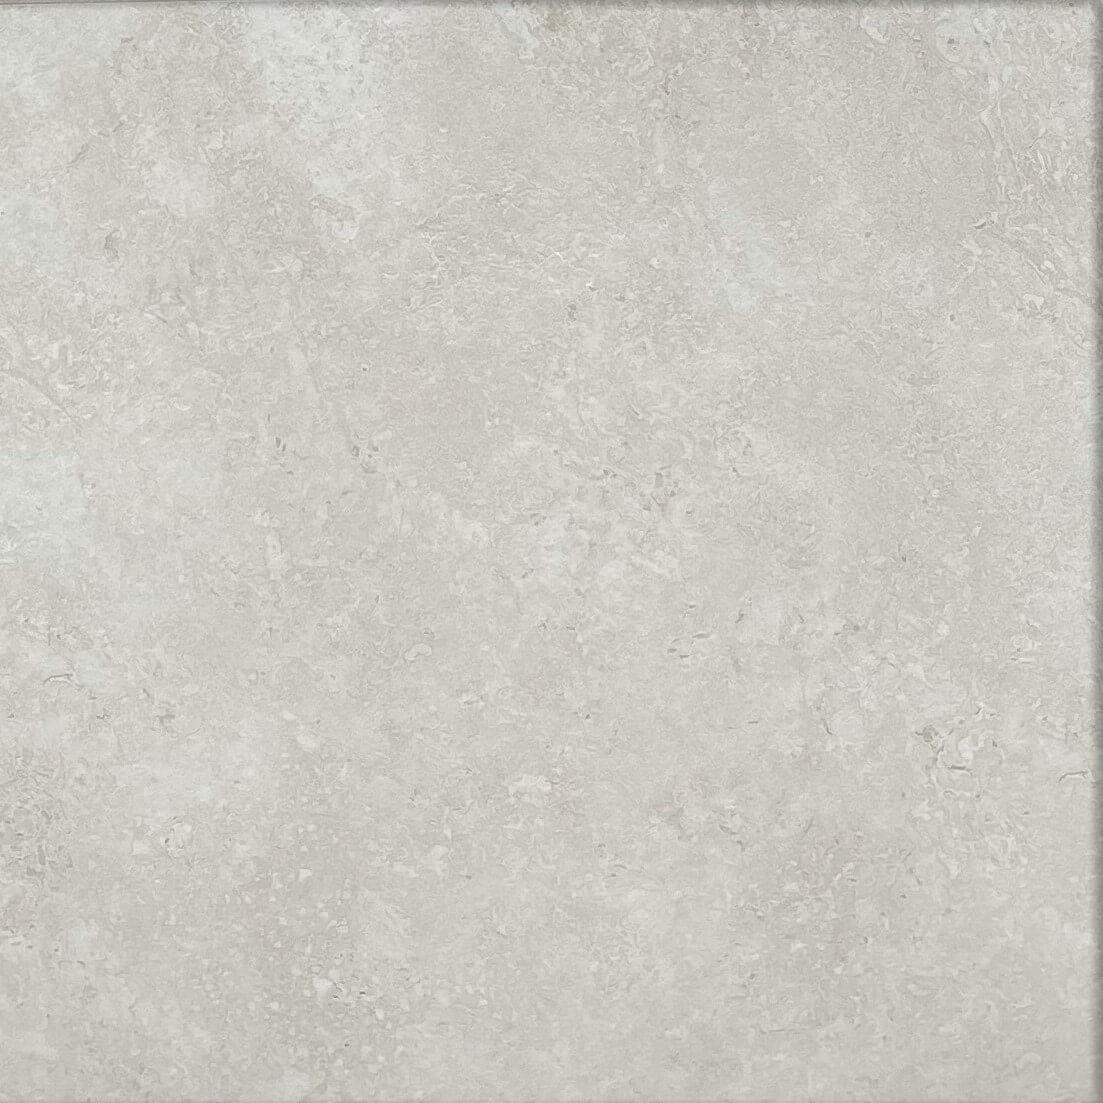 Limestone White Anti Slip Rectified Porcelain Tile 3850